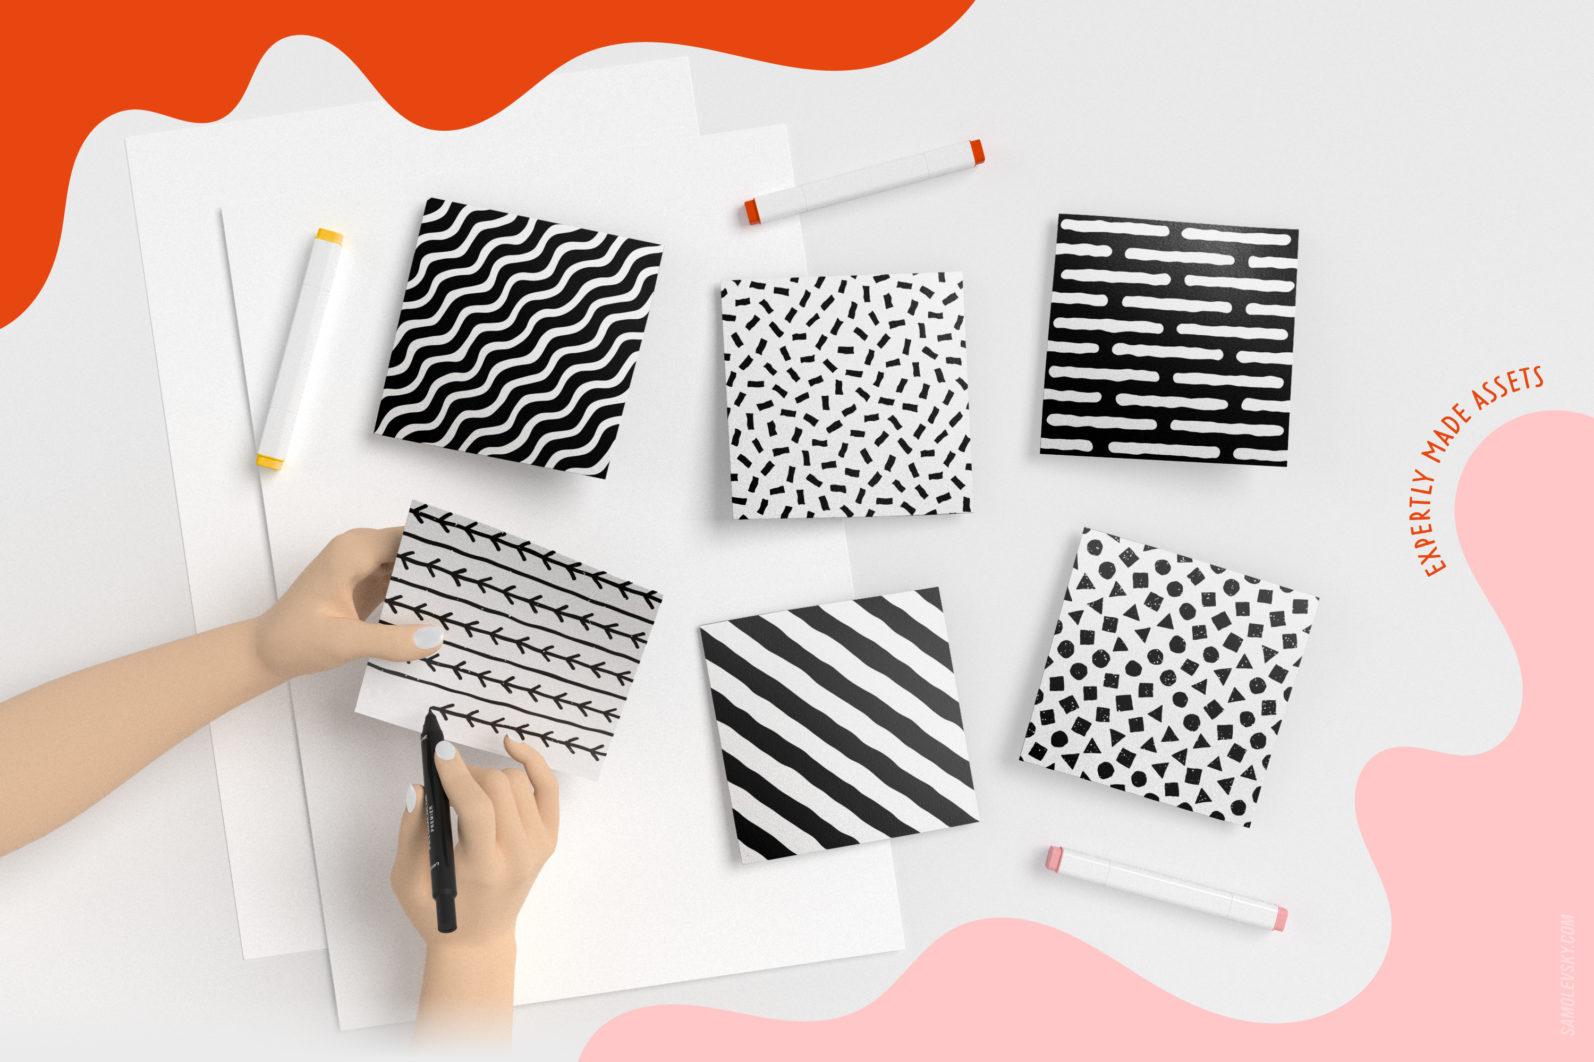 Handmade patterns bundle - 300 seamless patterns, brushes, and shapes - Samolevsky.com Handmade patterns bundle 10 scaled -